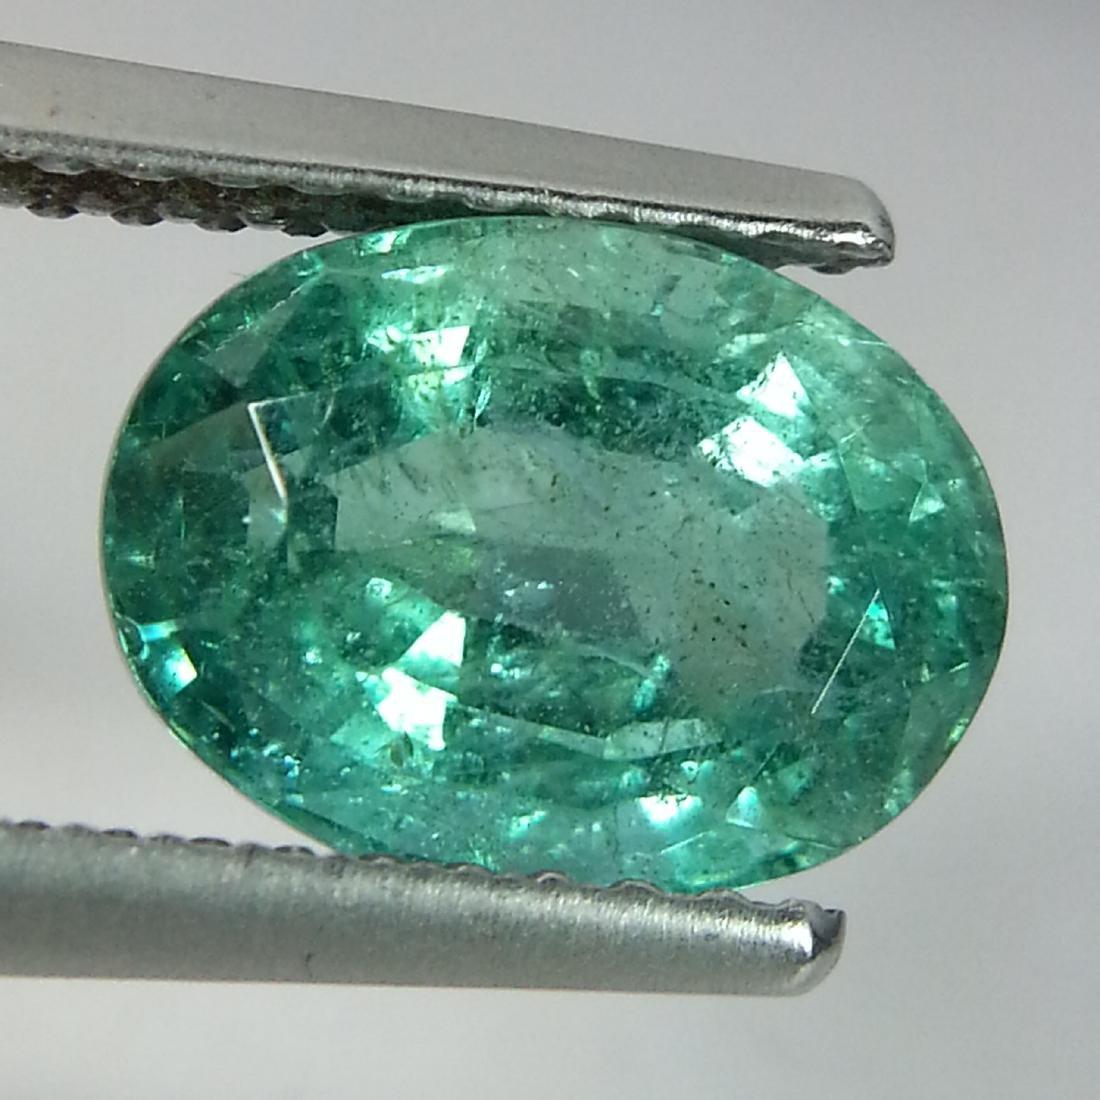 Emerald - 2.20 ct - 2